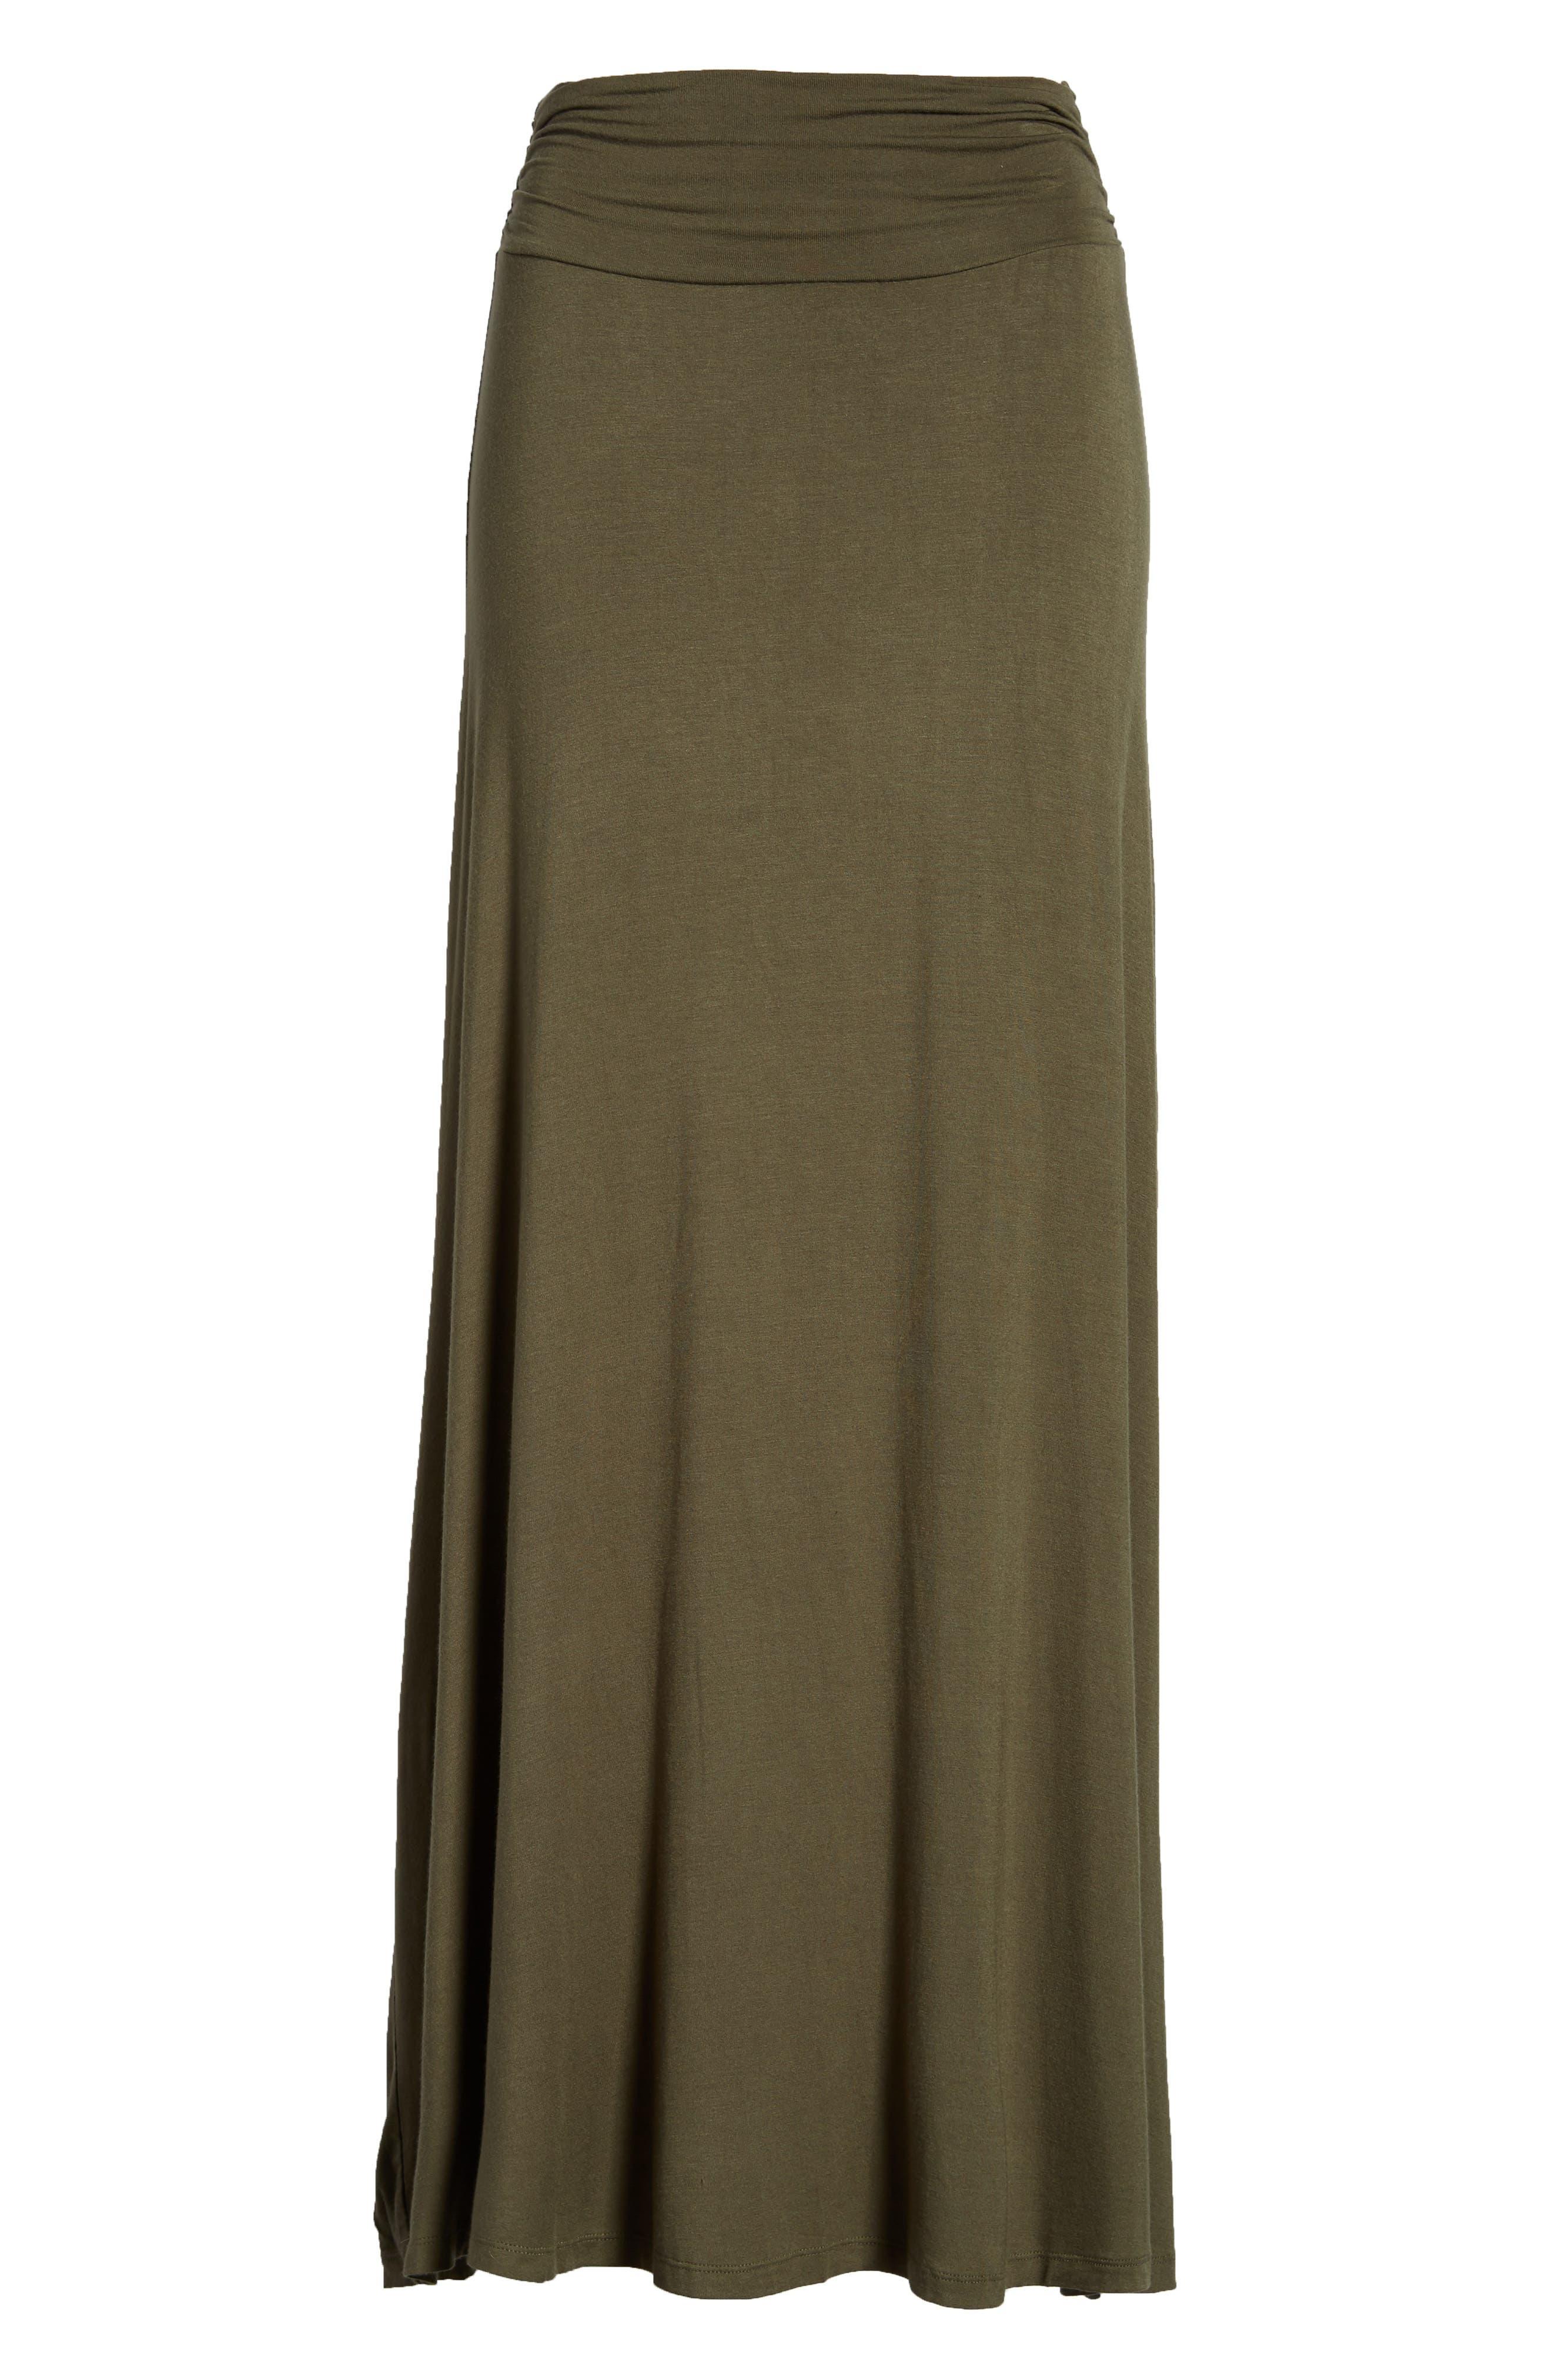 Ruched Waist Side Slit Maxi Skirt,                             Alternate thumbnail 6, color,                             302